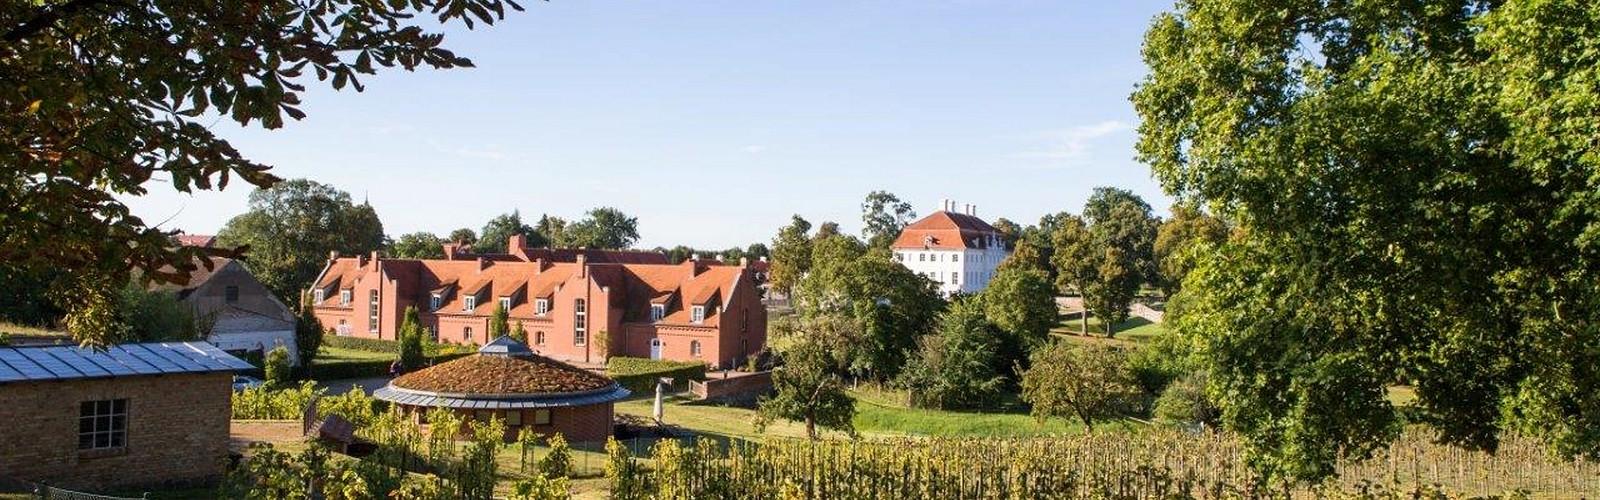 View from the vineyard, photo: Schlosswirt Meseberg